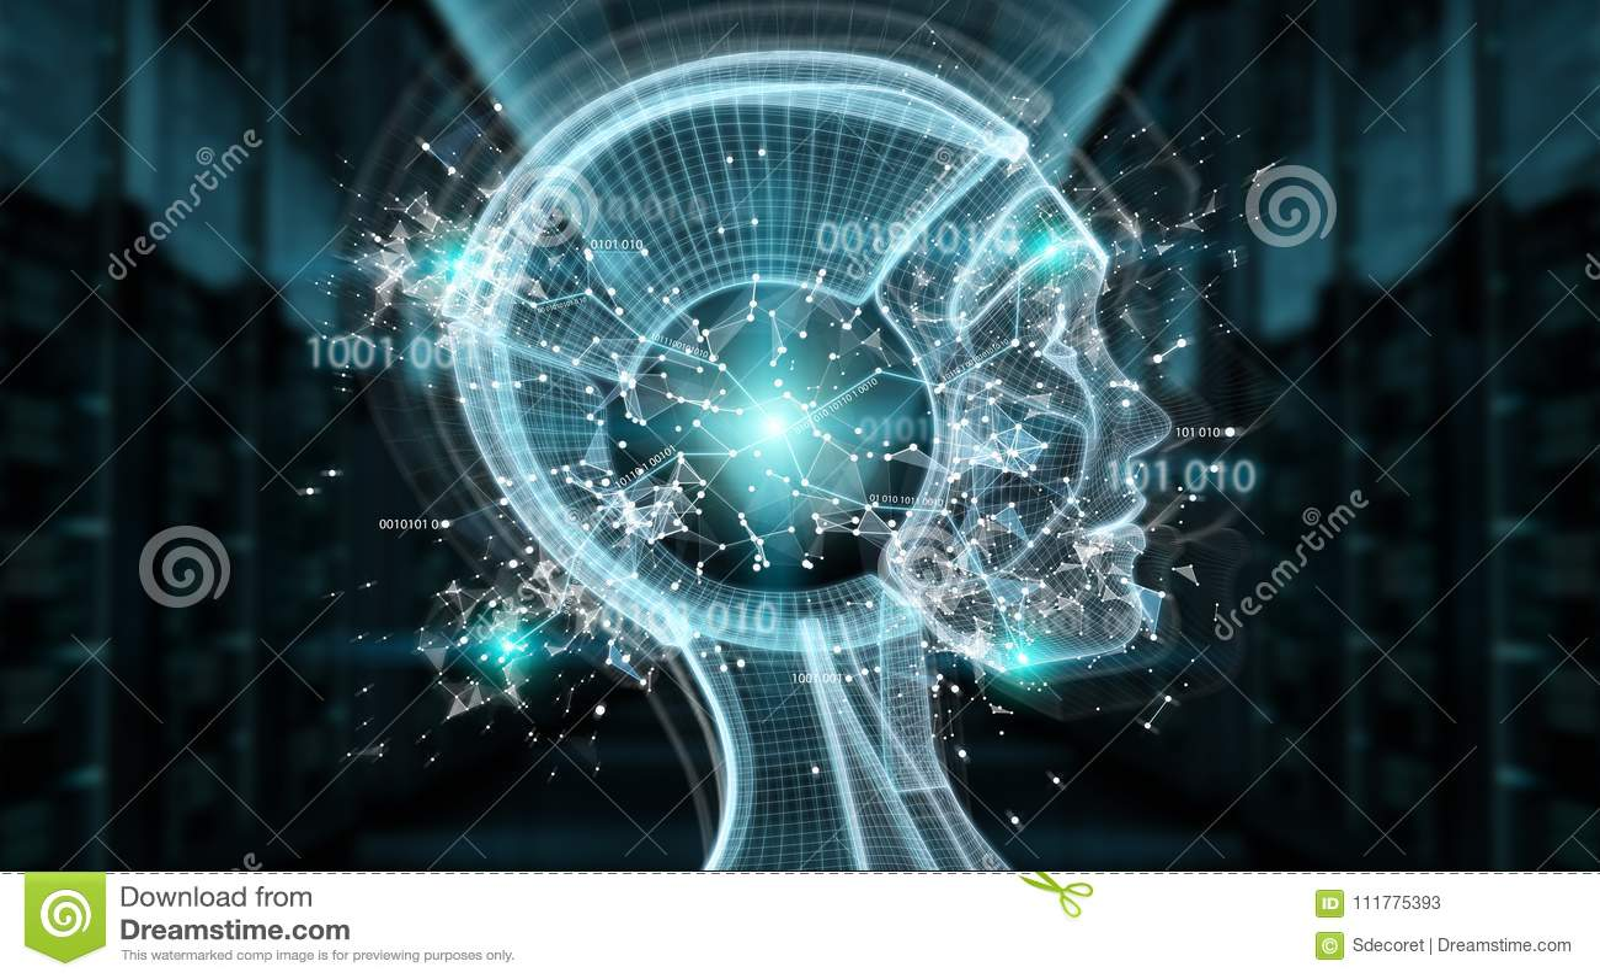 Digital artificial intelligence cyborg interface 3D rendering